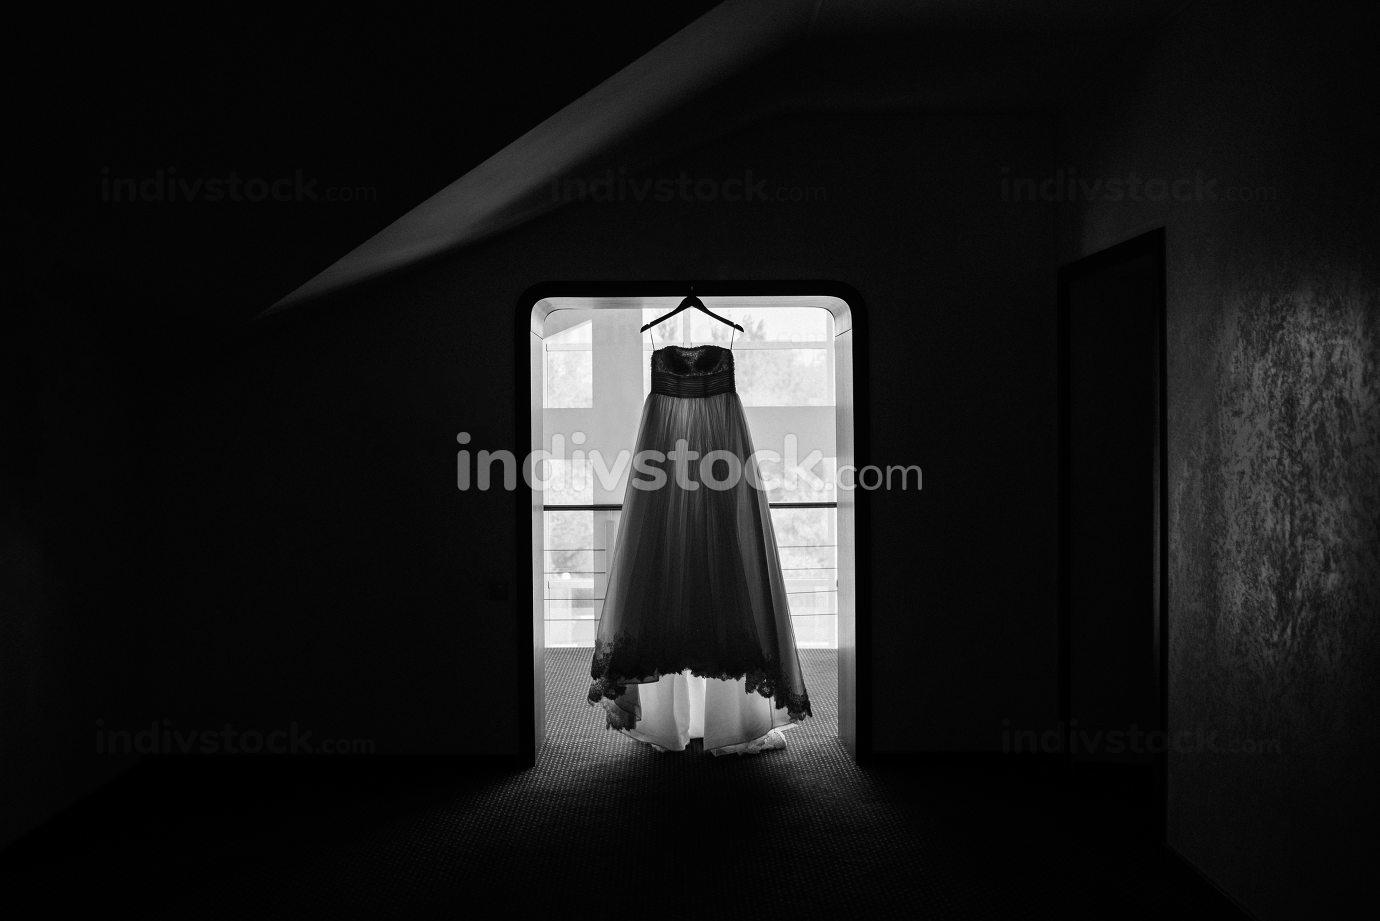 perfect wedding dress on the wedding day